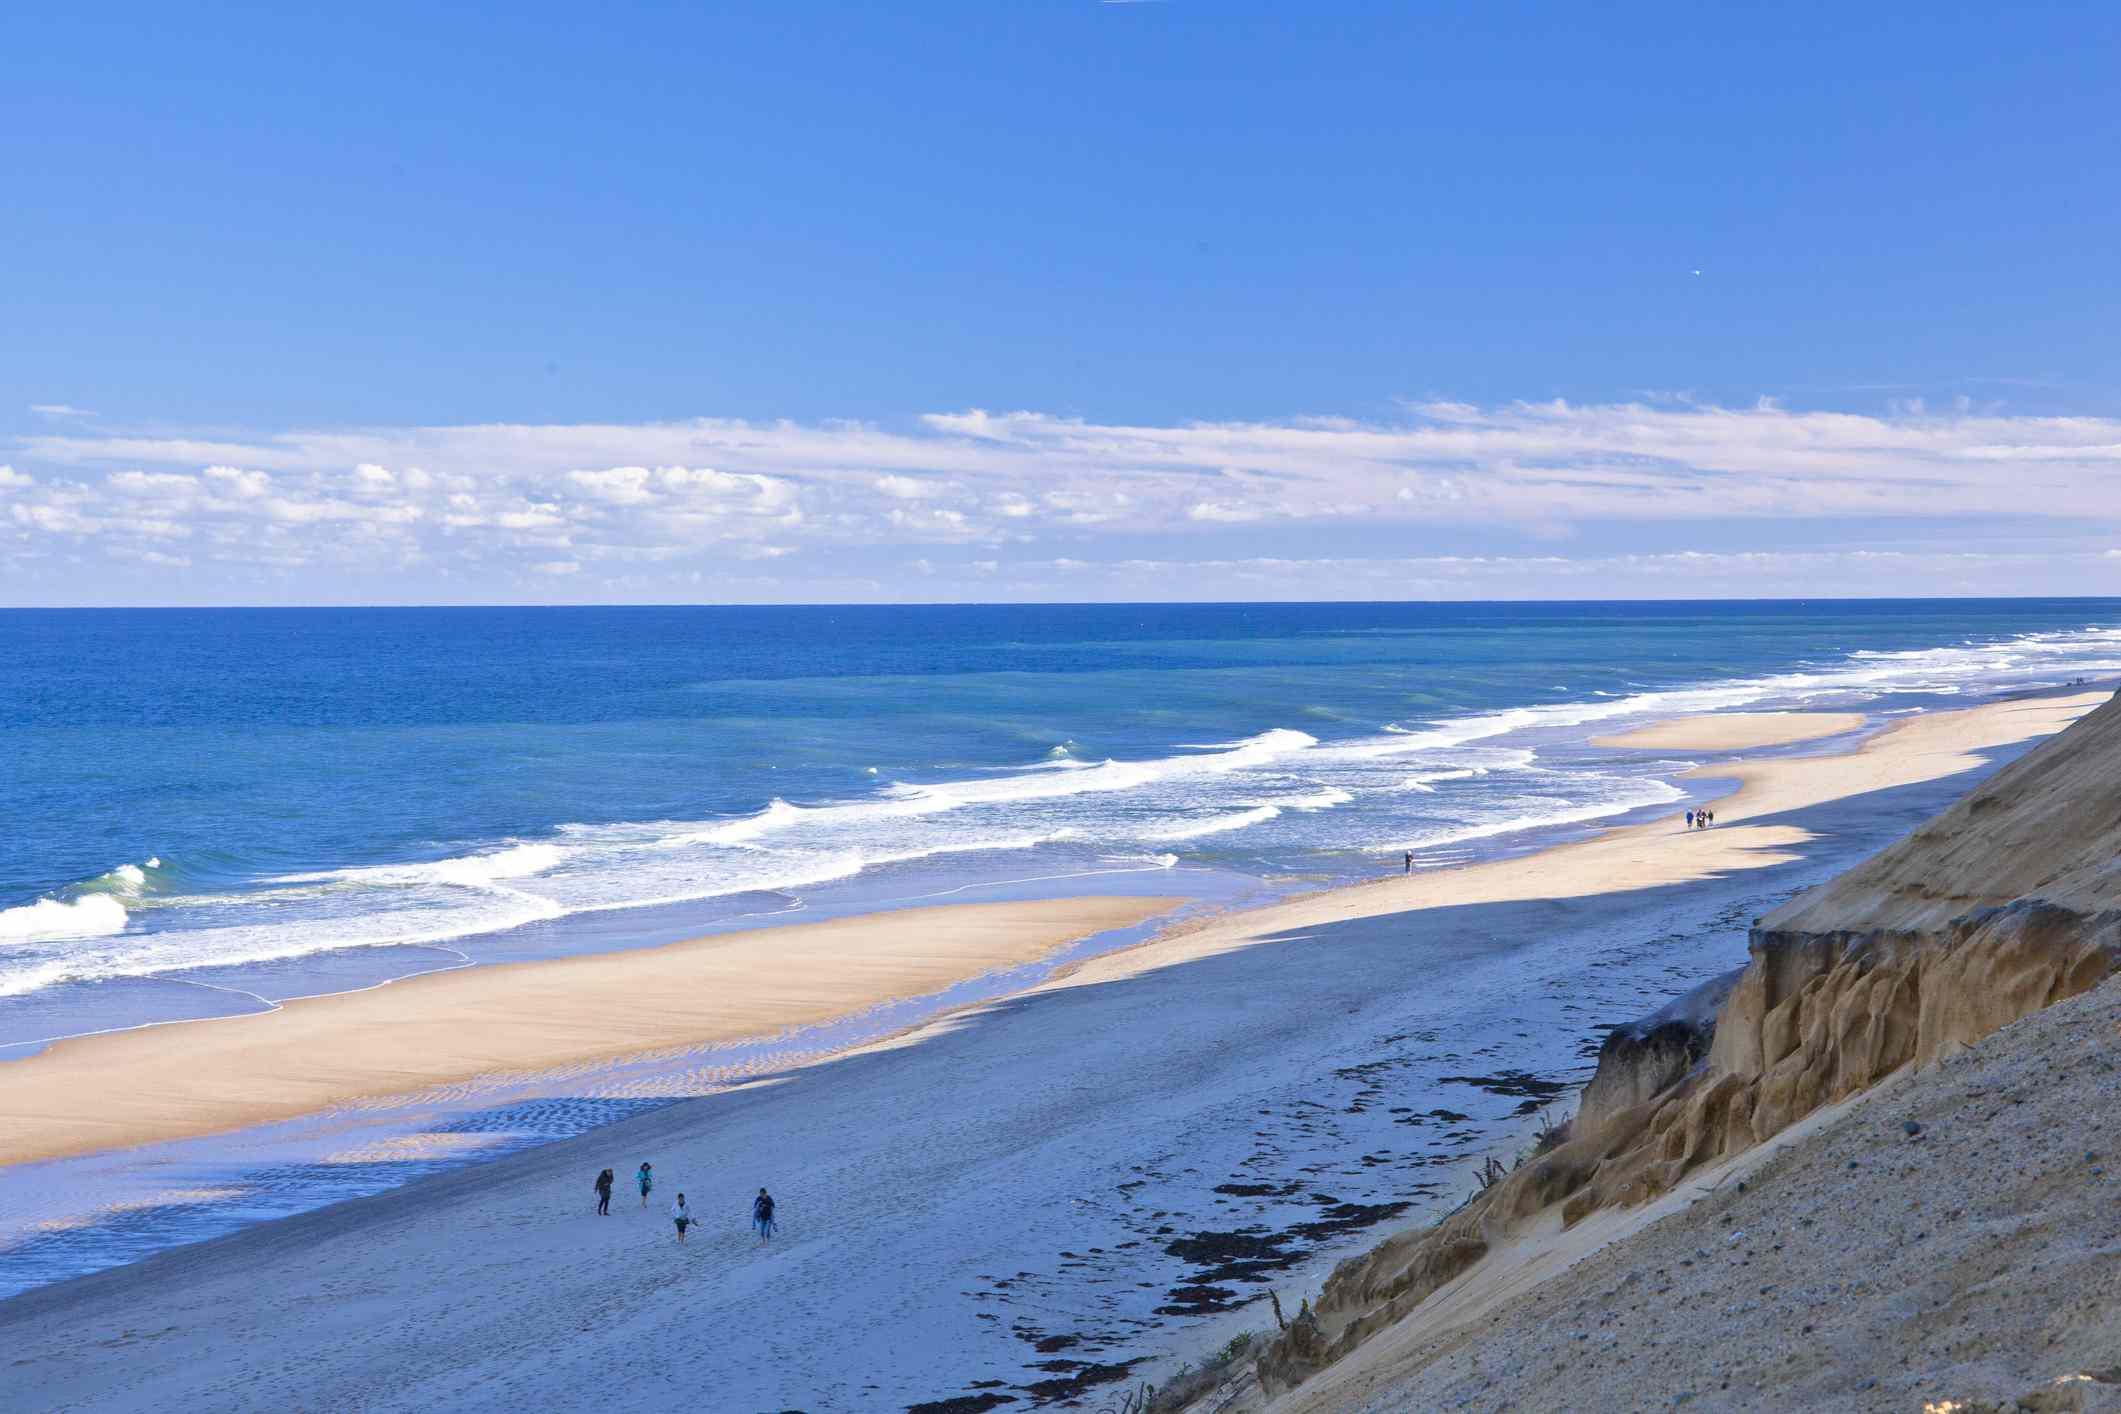 Massachusetts' Cape Cod National Seashore